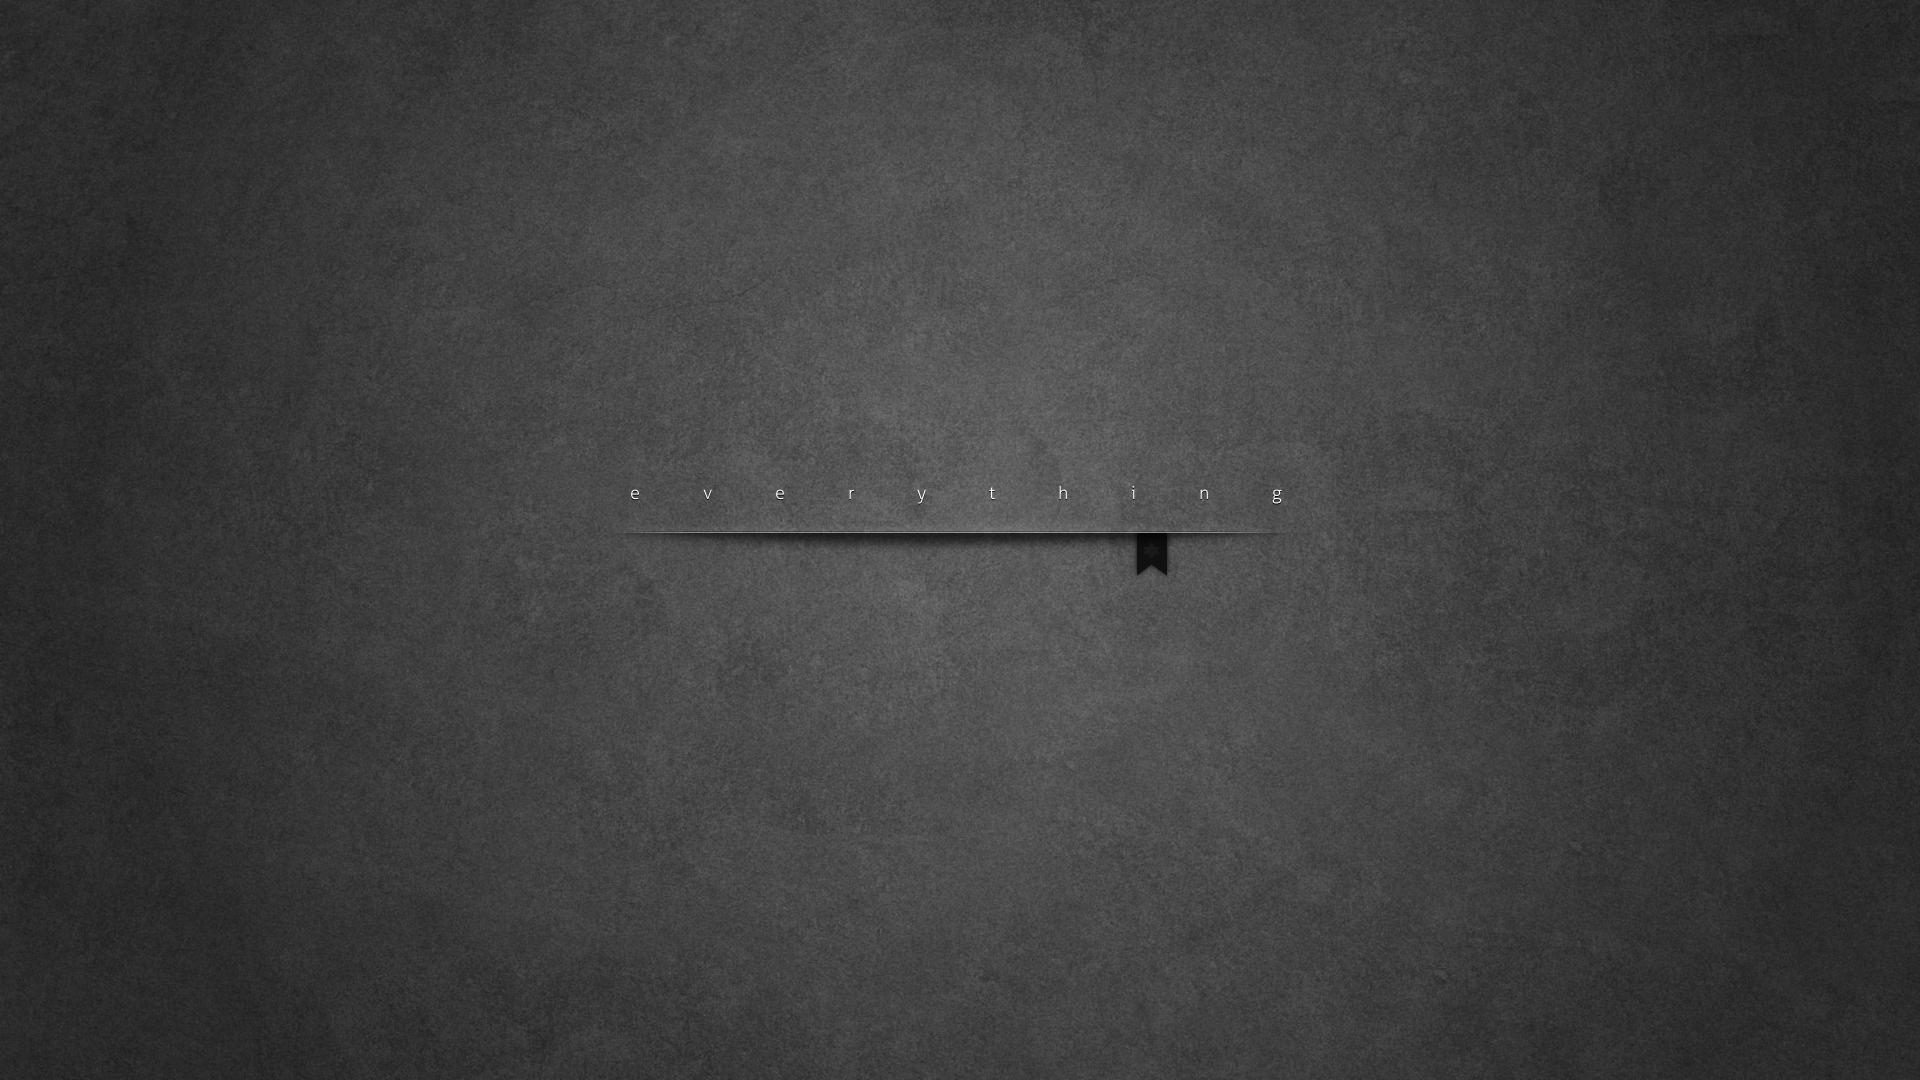 minimalist wallpaper for iphone